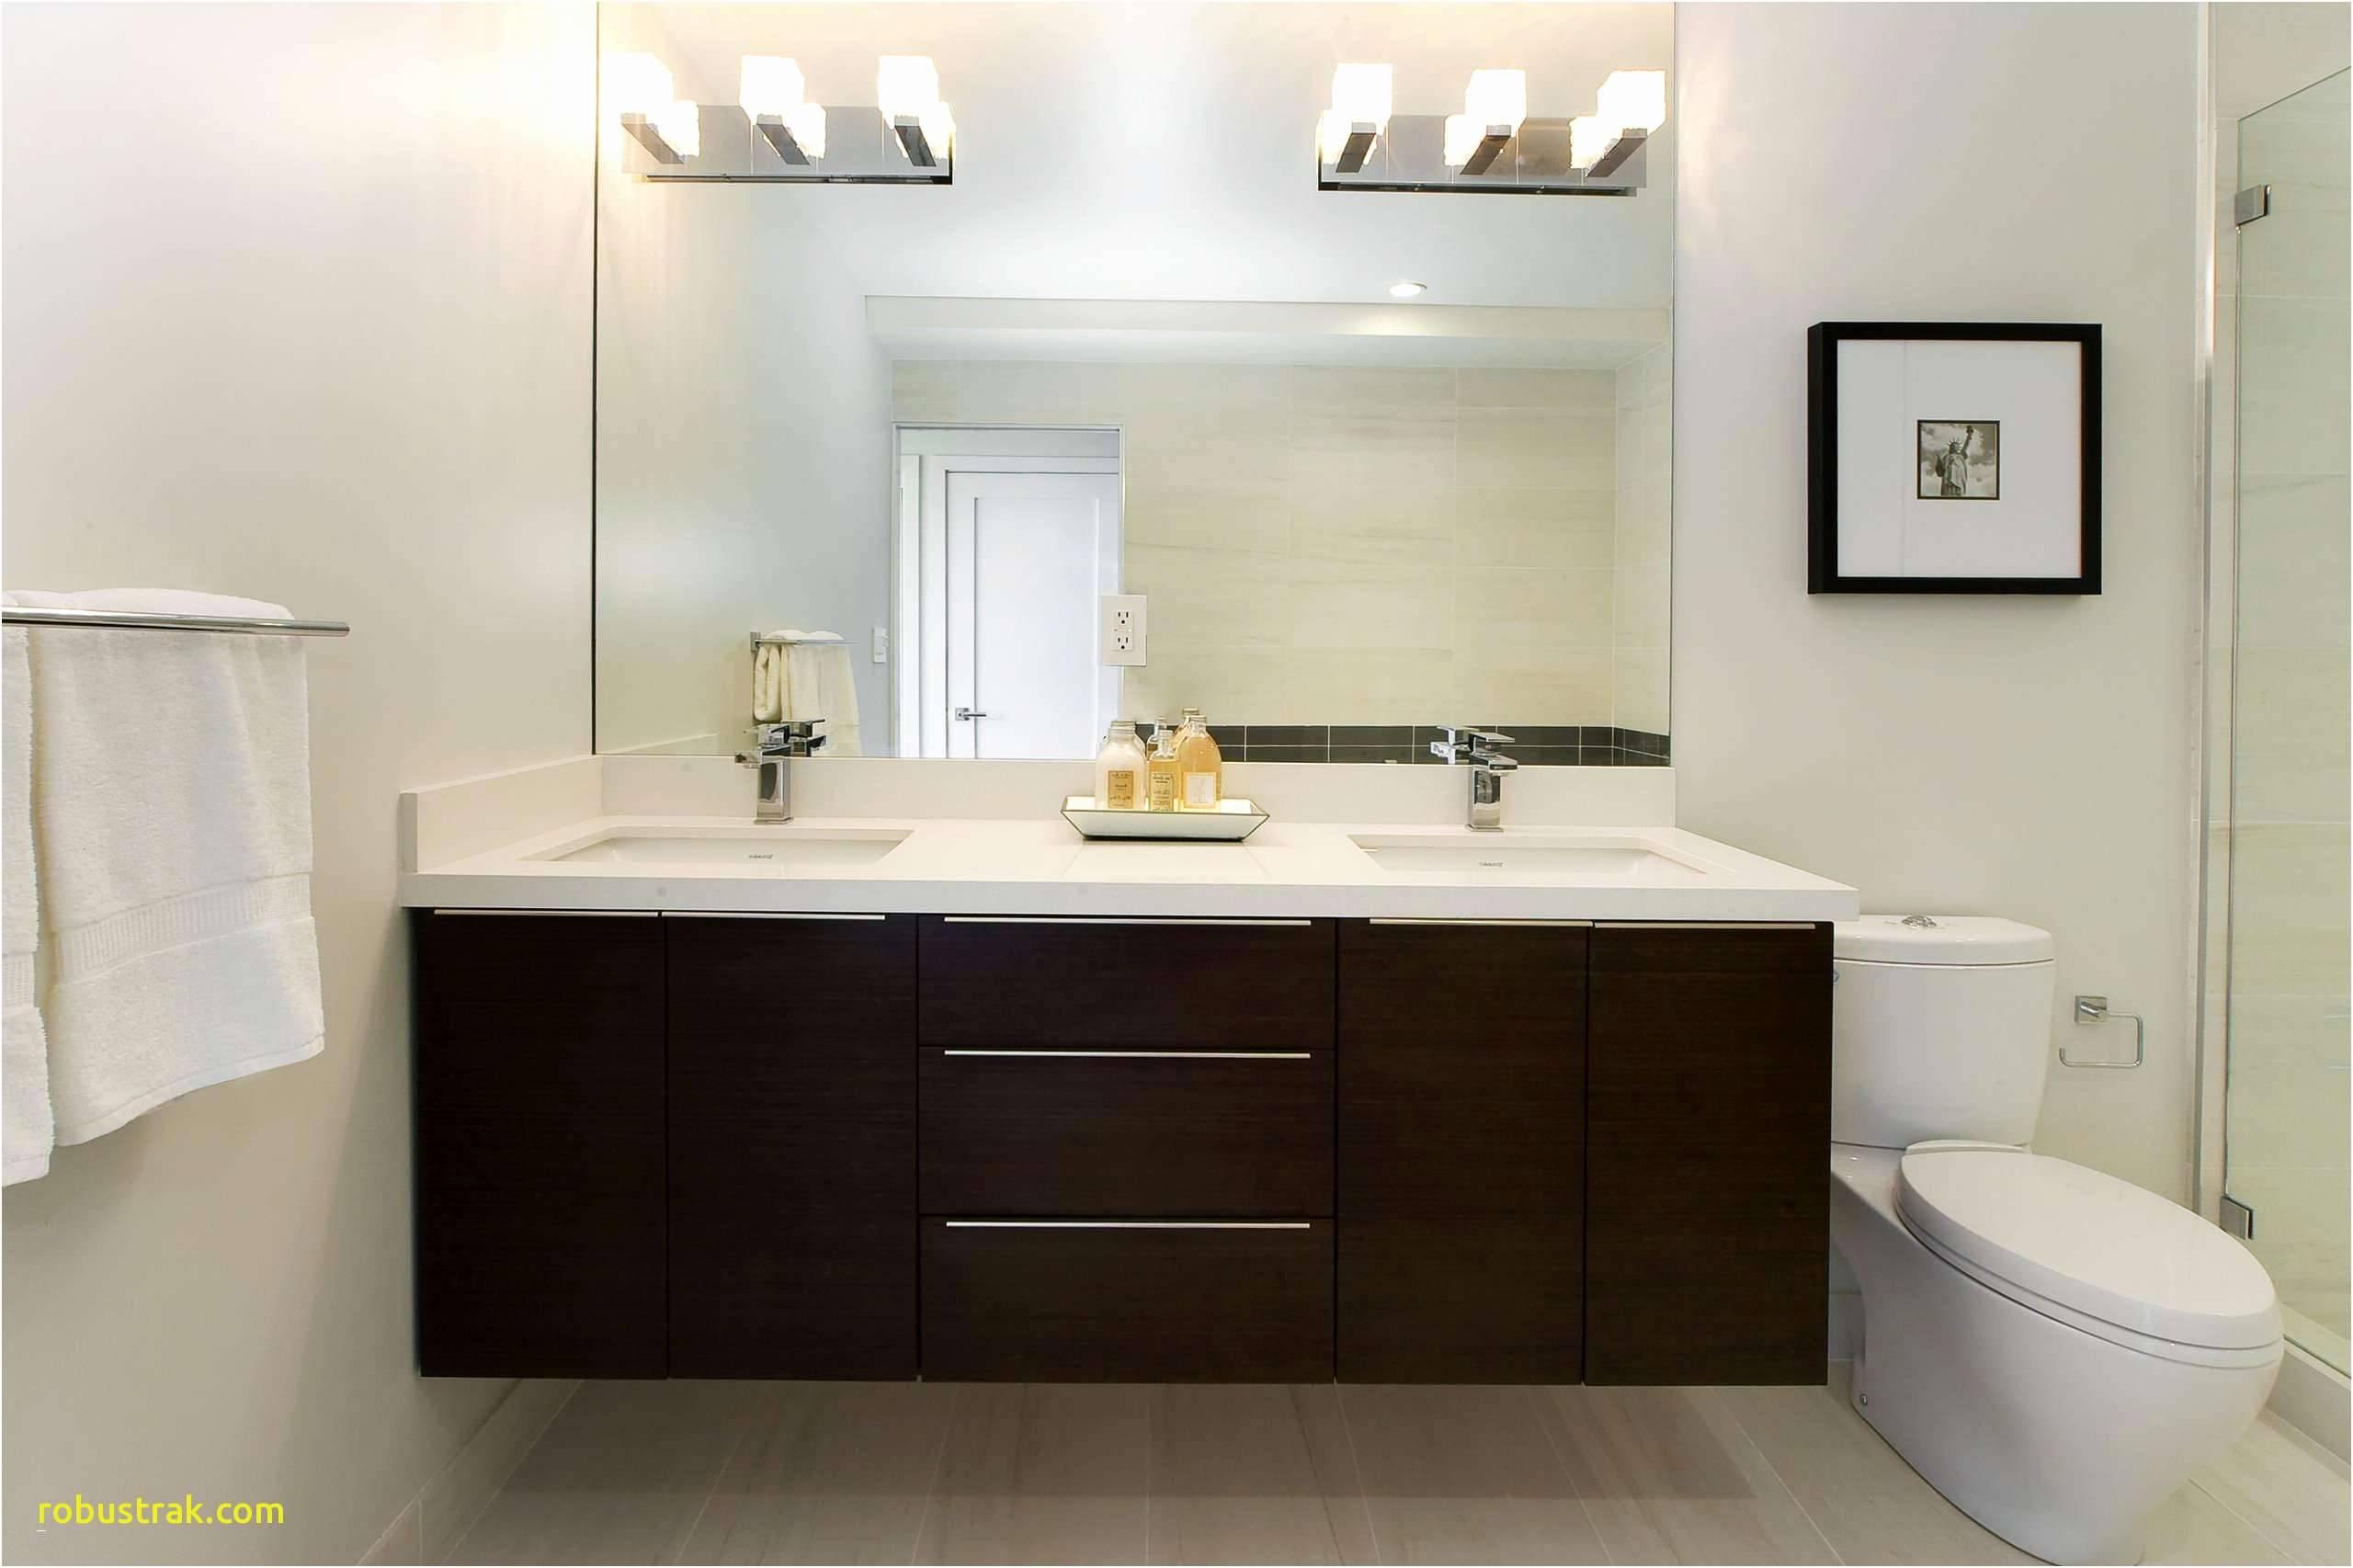 rustic decor ideas for bathroom awesome luxury rustic bathrooms of rustic decor ideas for bathroom